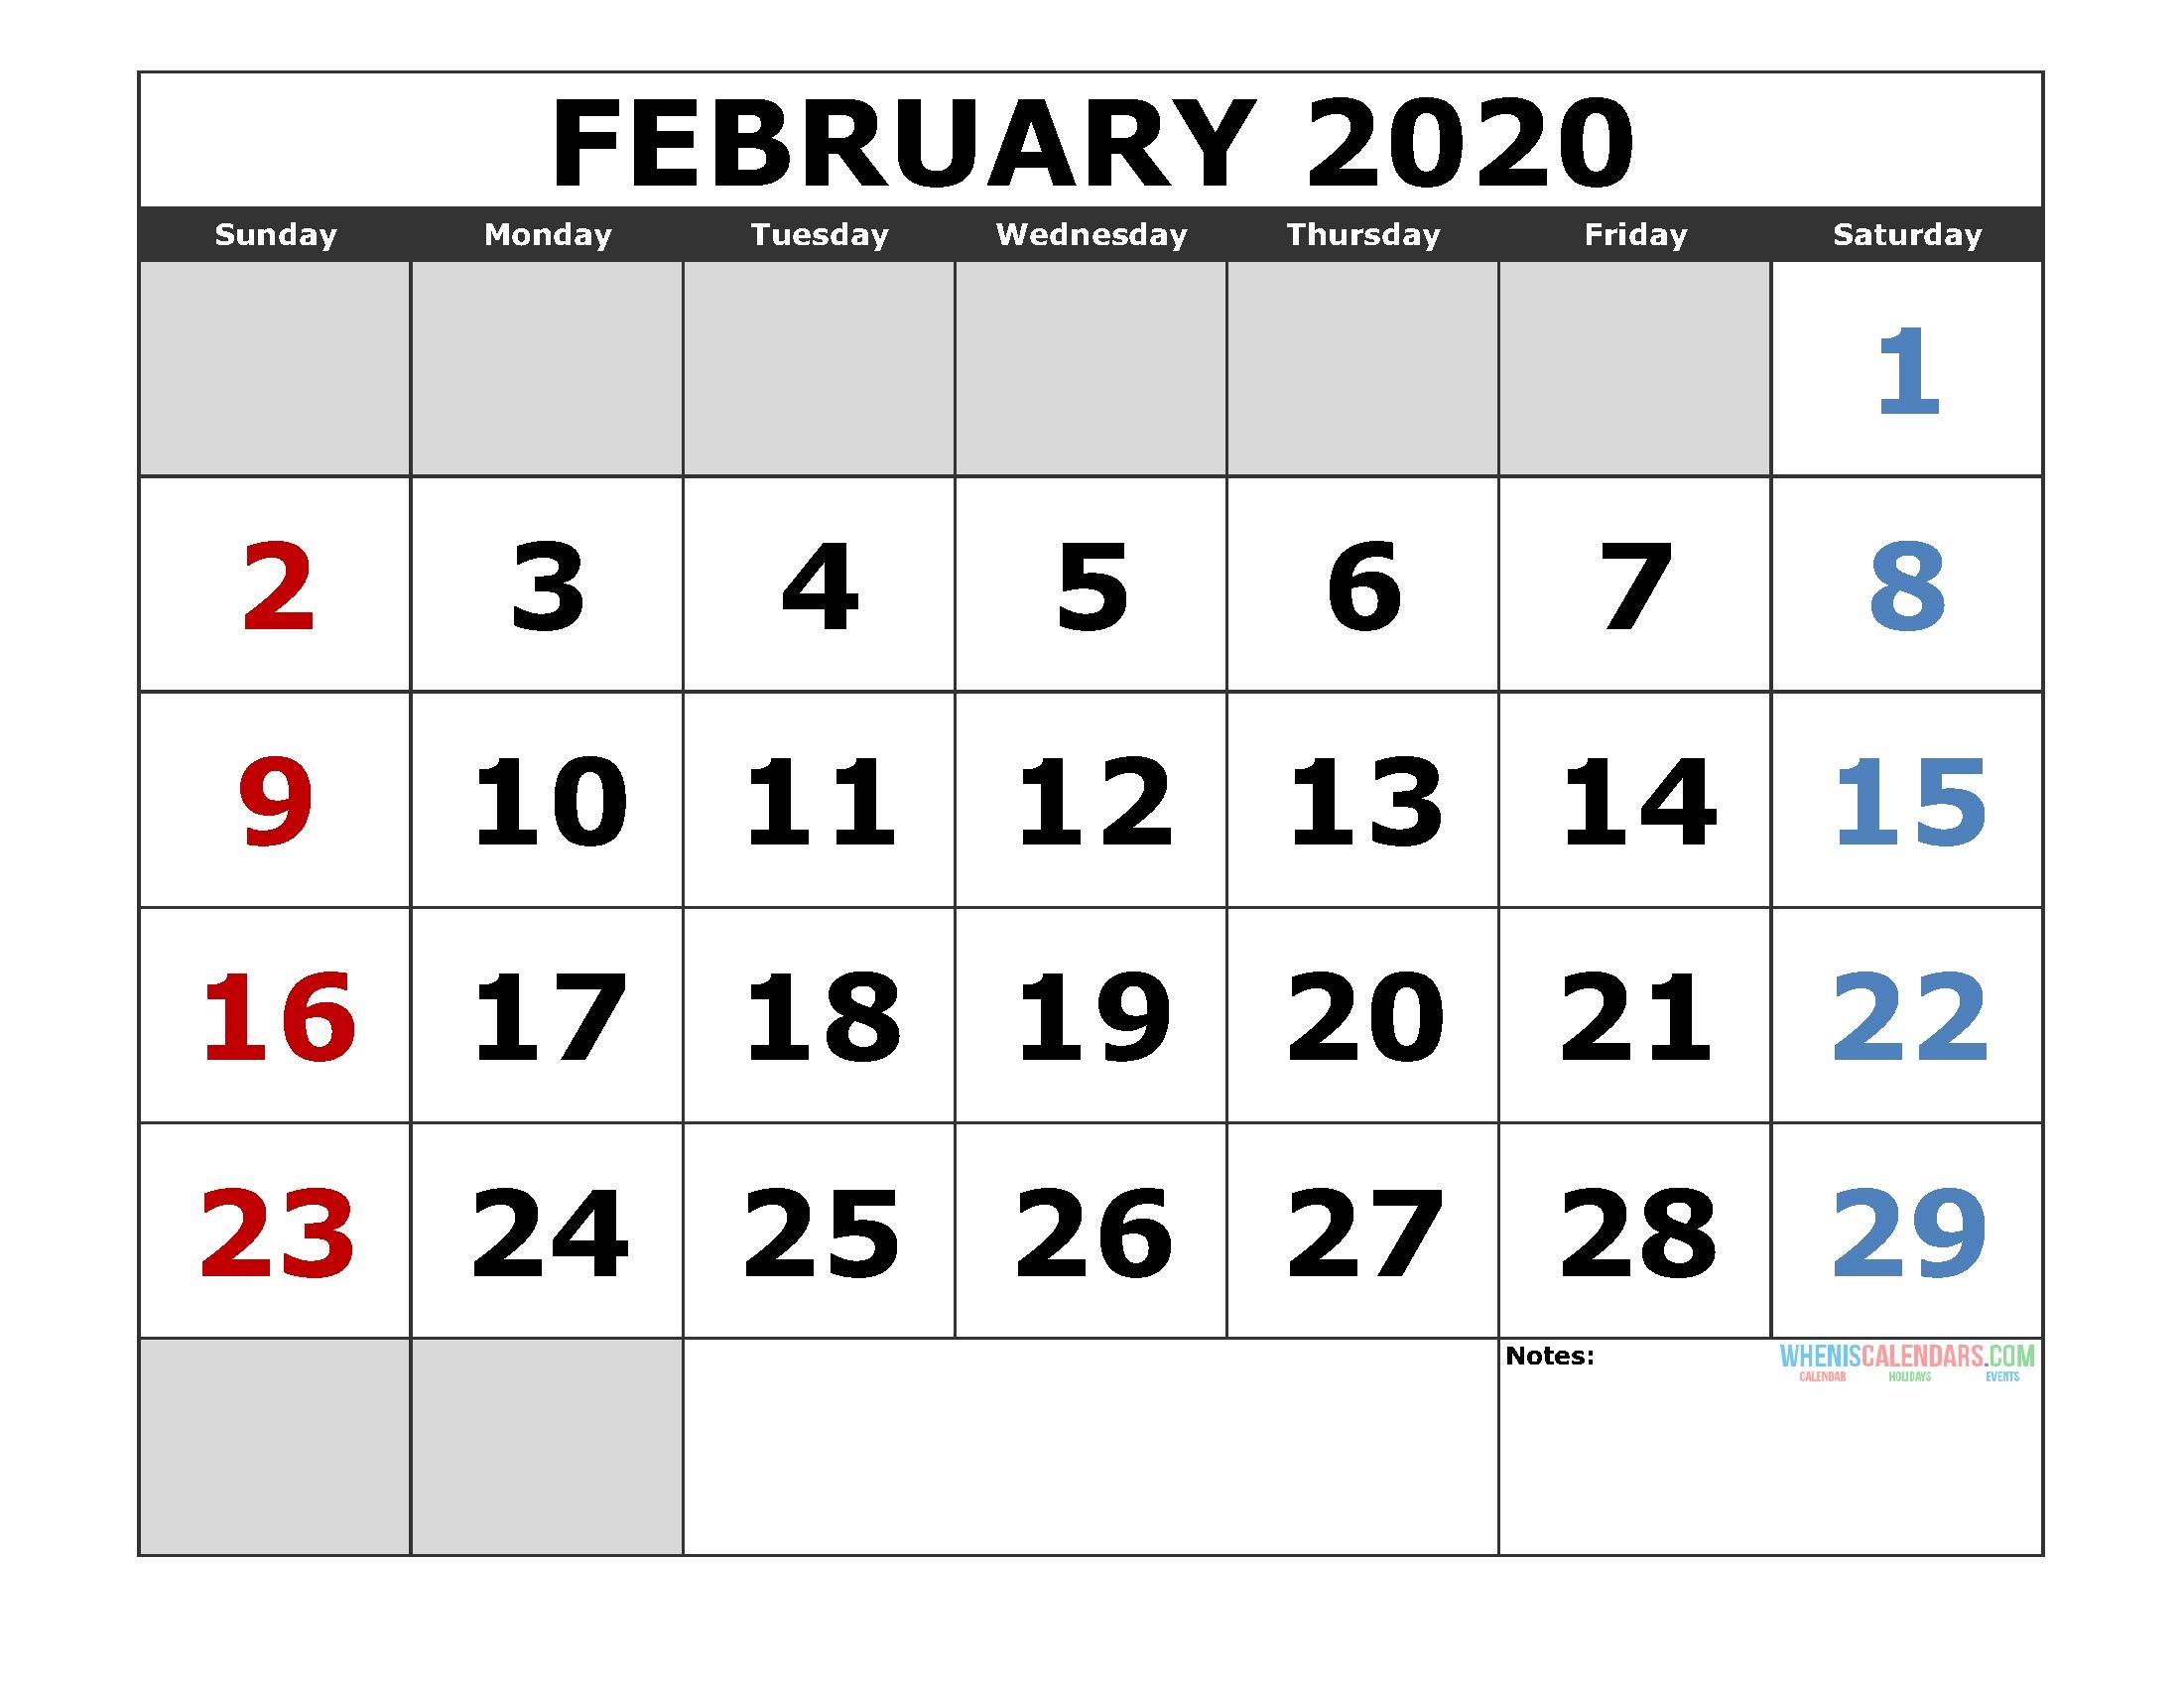 February 2020 Printable Calendar Template Excel, Pdf, Image